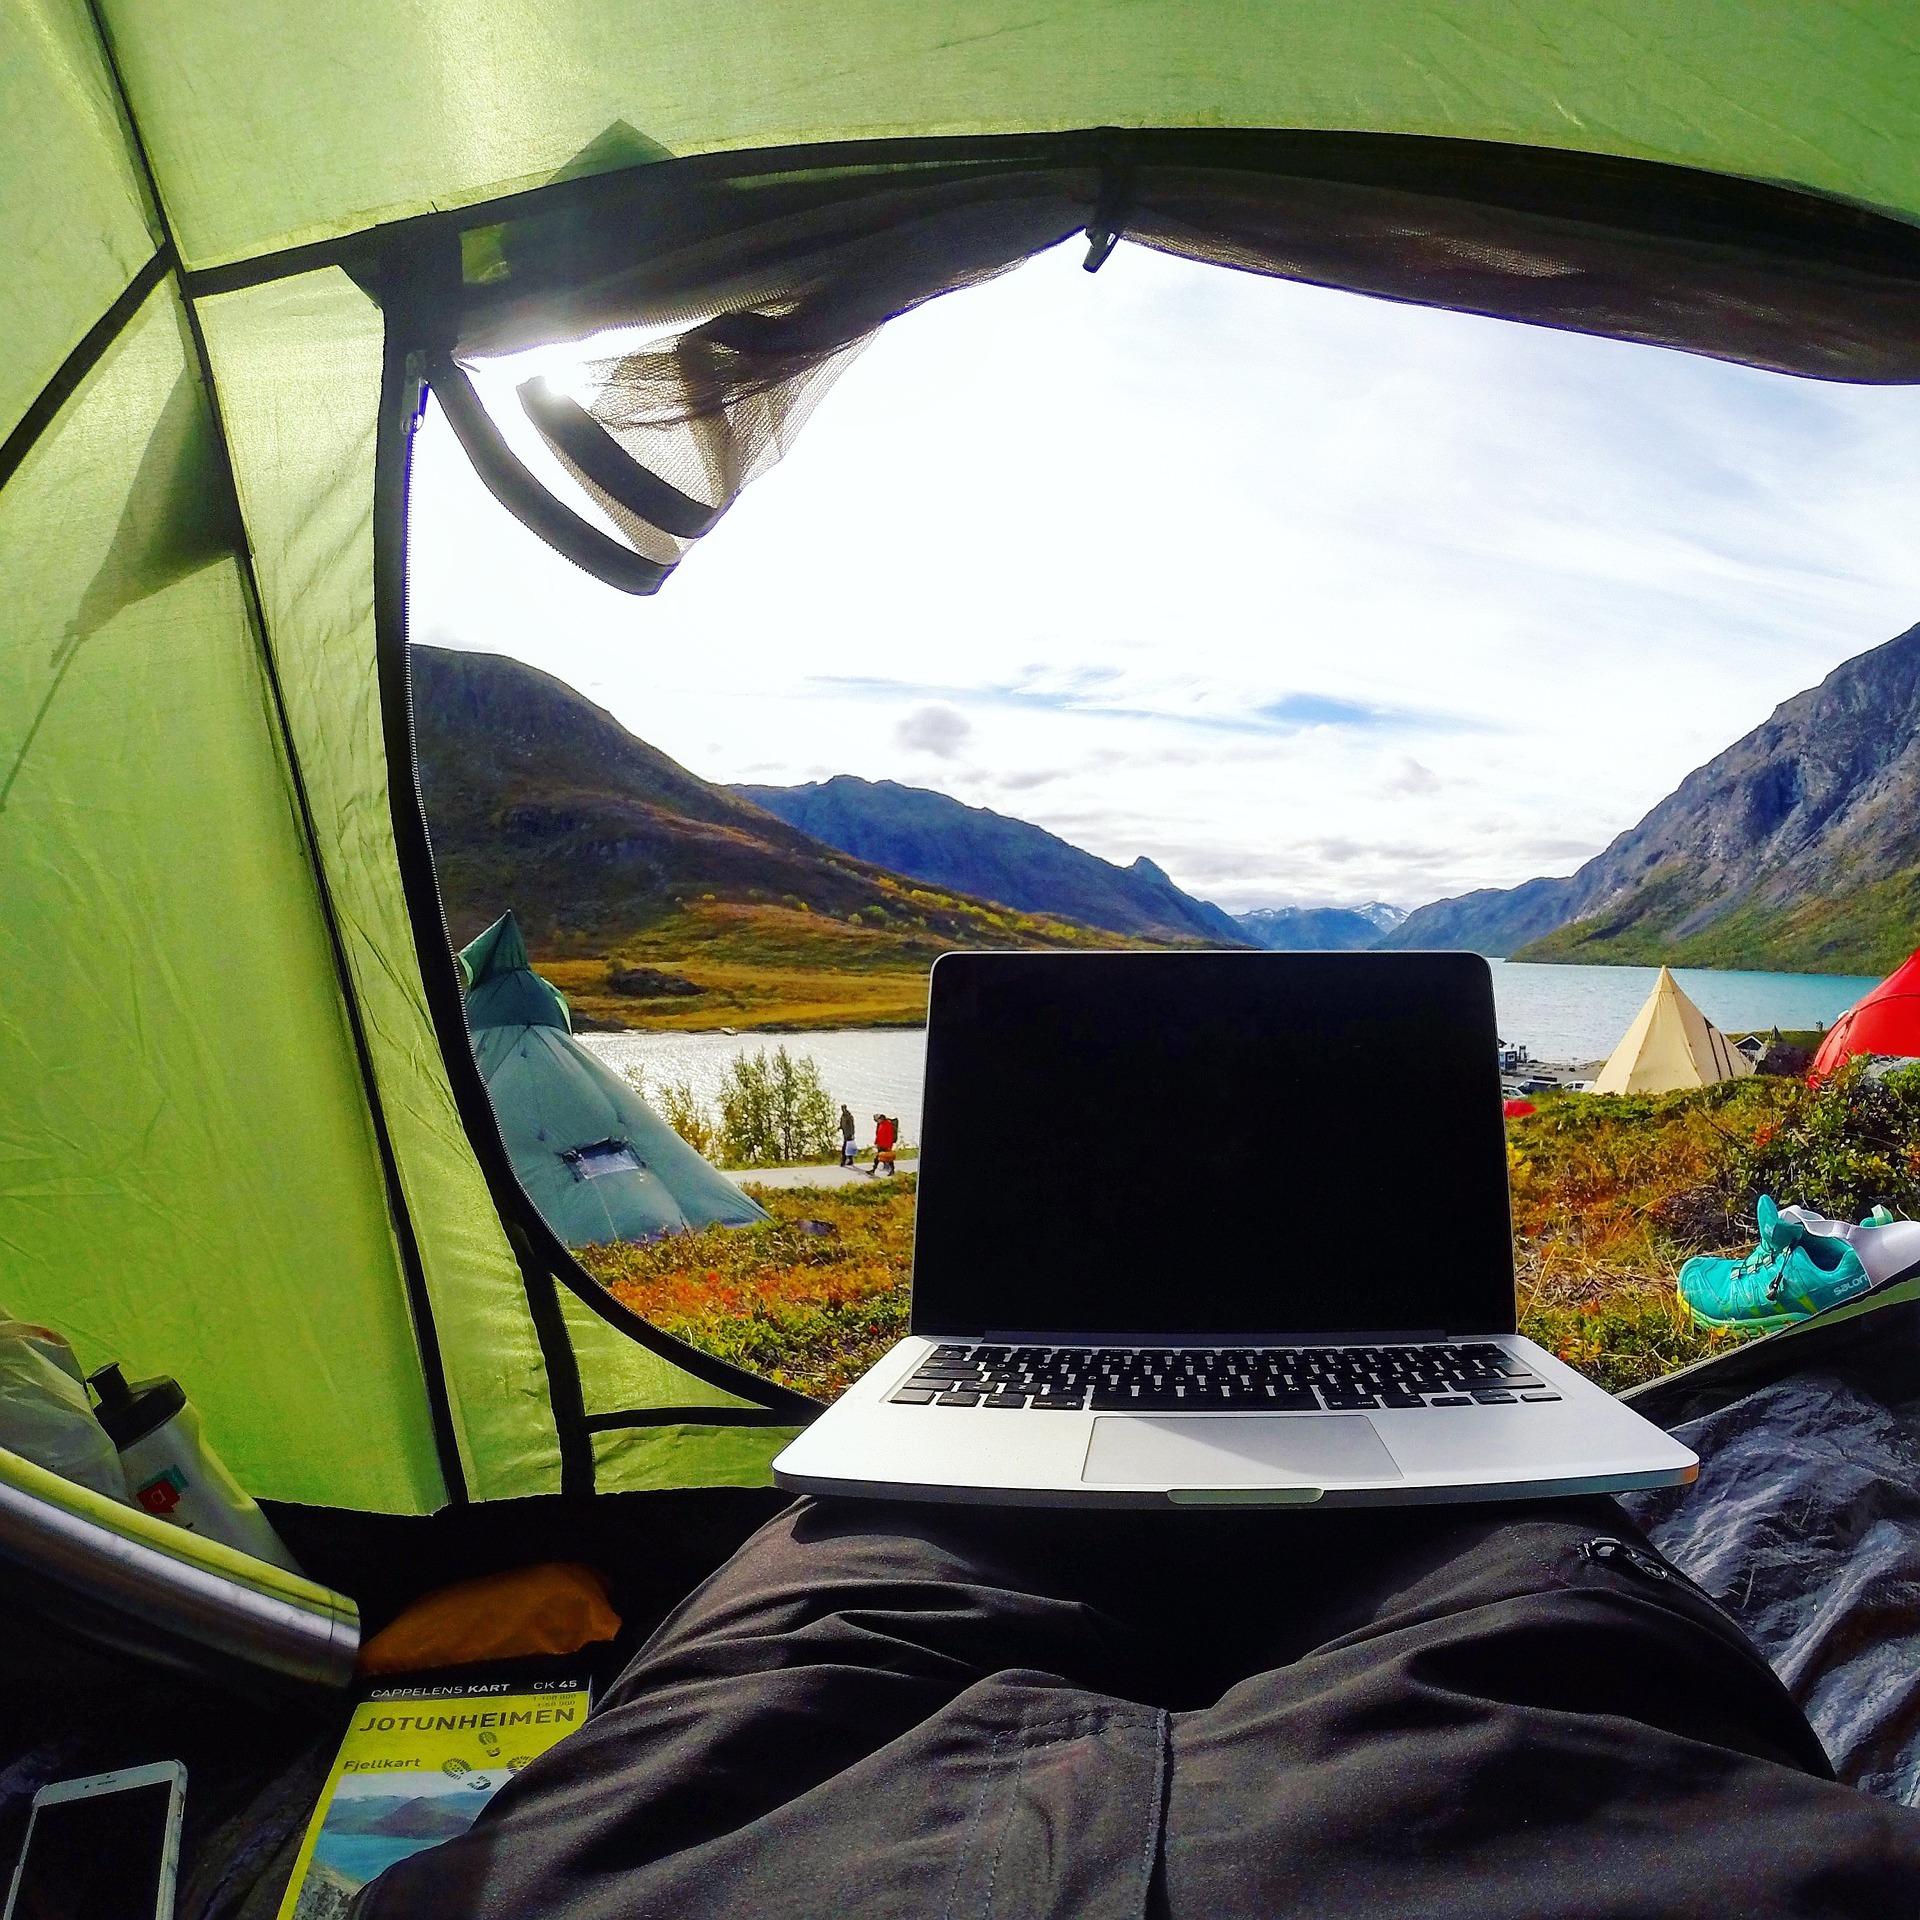 camping-2605250_1920.jpg